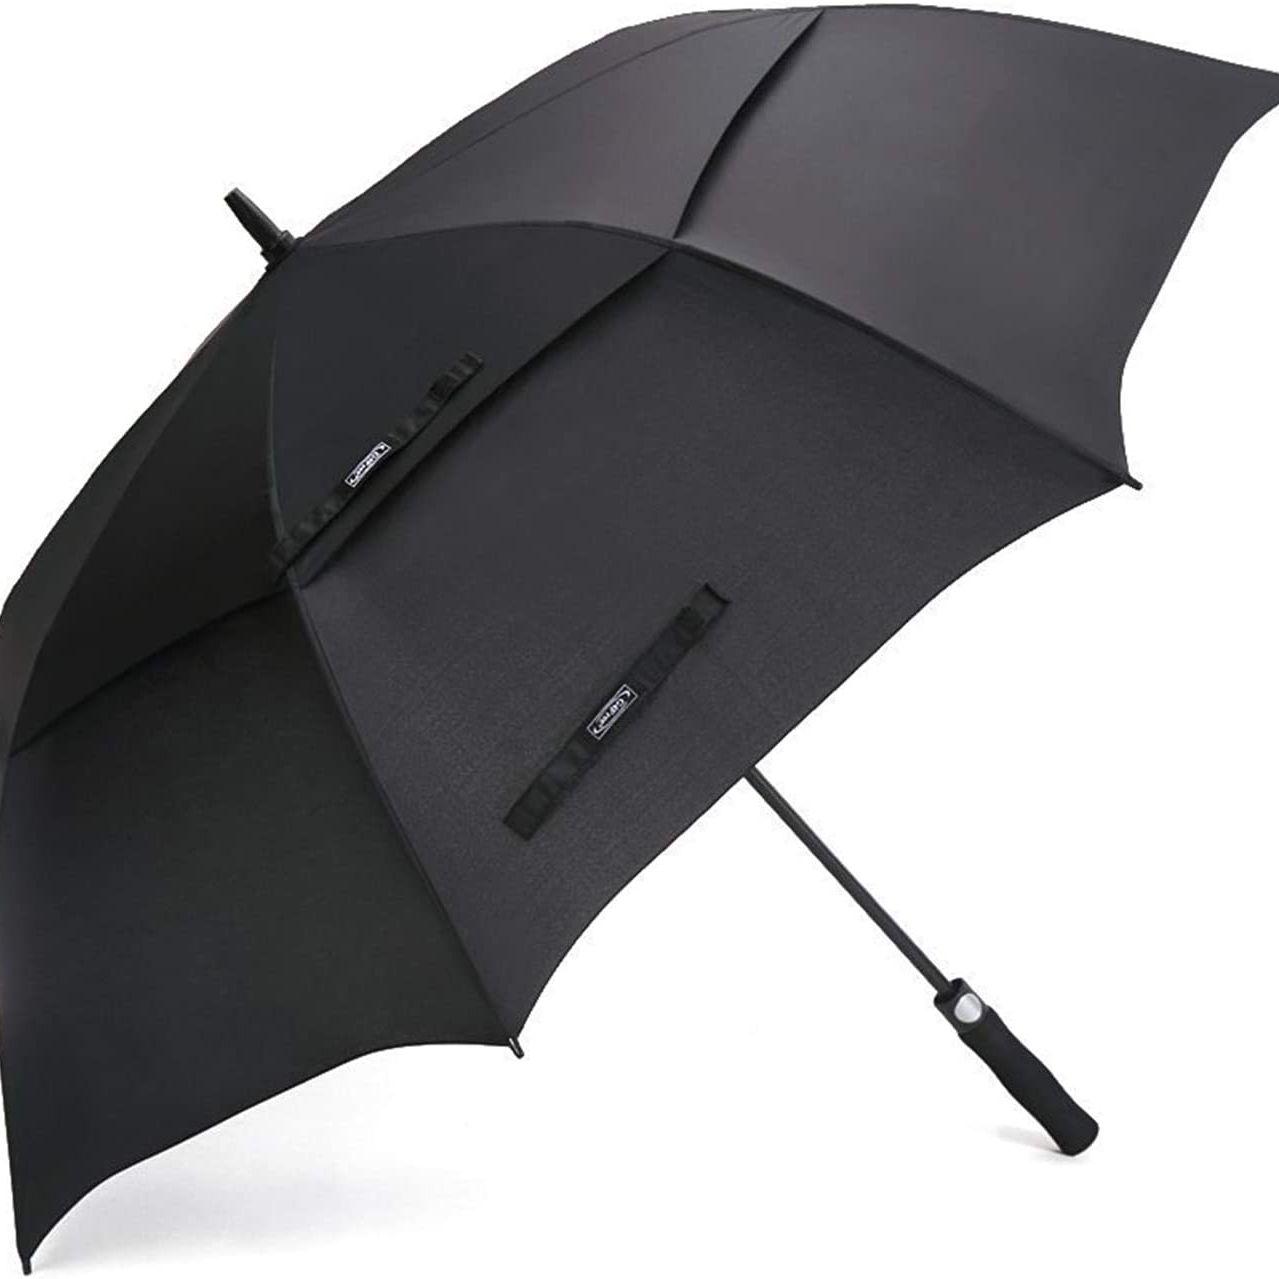 UV Protect Floral Rain Umbrella Chic Three Folding Women Girl Durable Portable Umbrellas Automatic Rain Gear